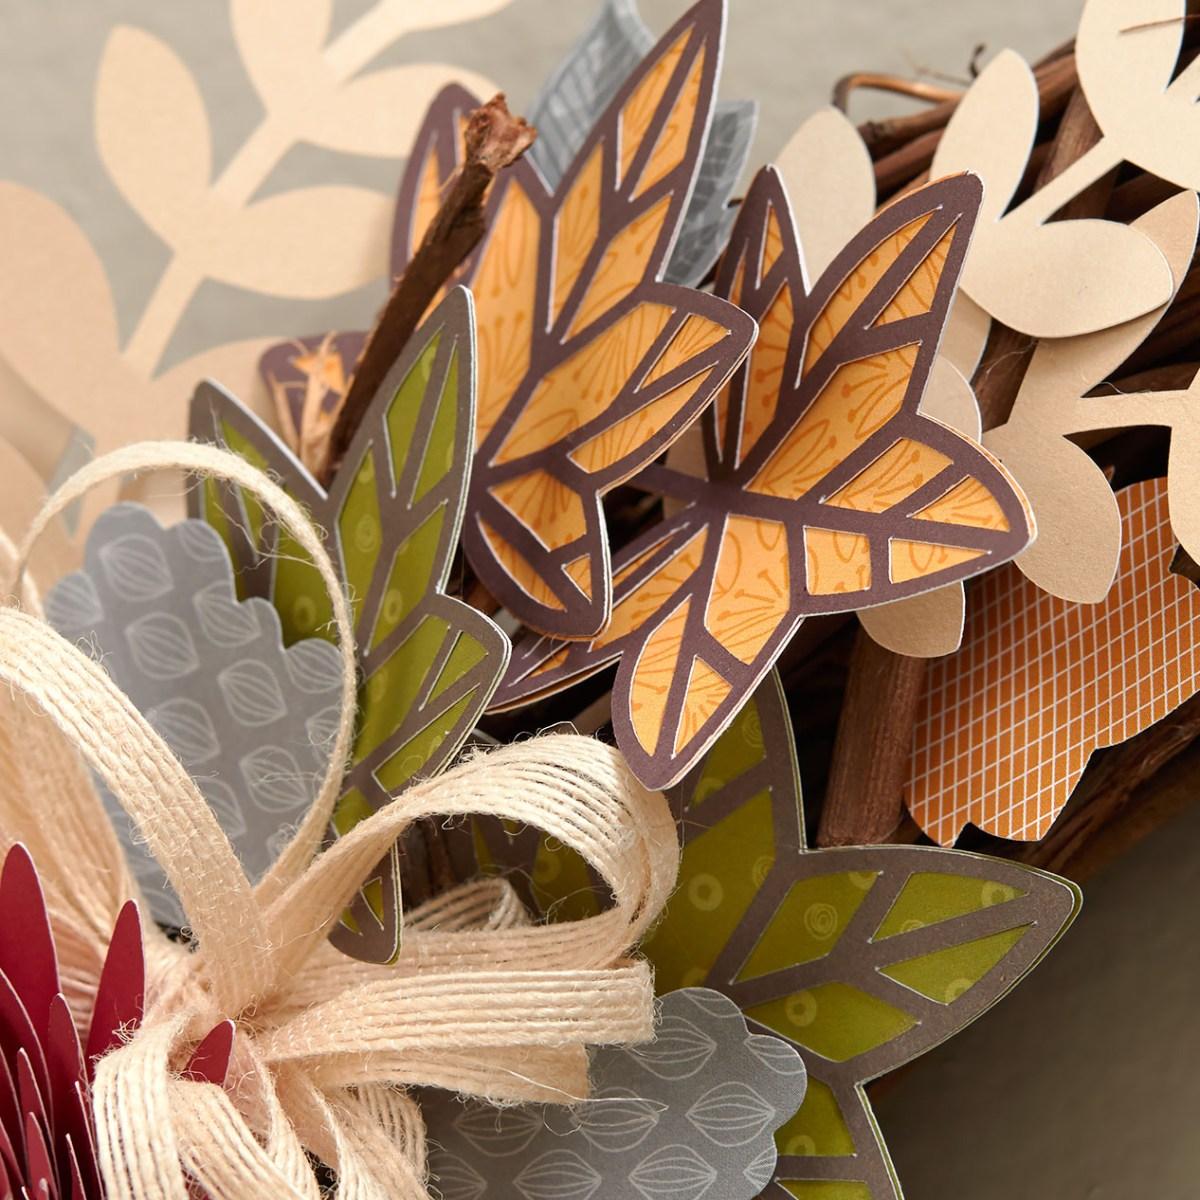 fall leaves #ctmh #closetomyheart #diy #flowermarket #cricut #wreath #fall #autumn